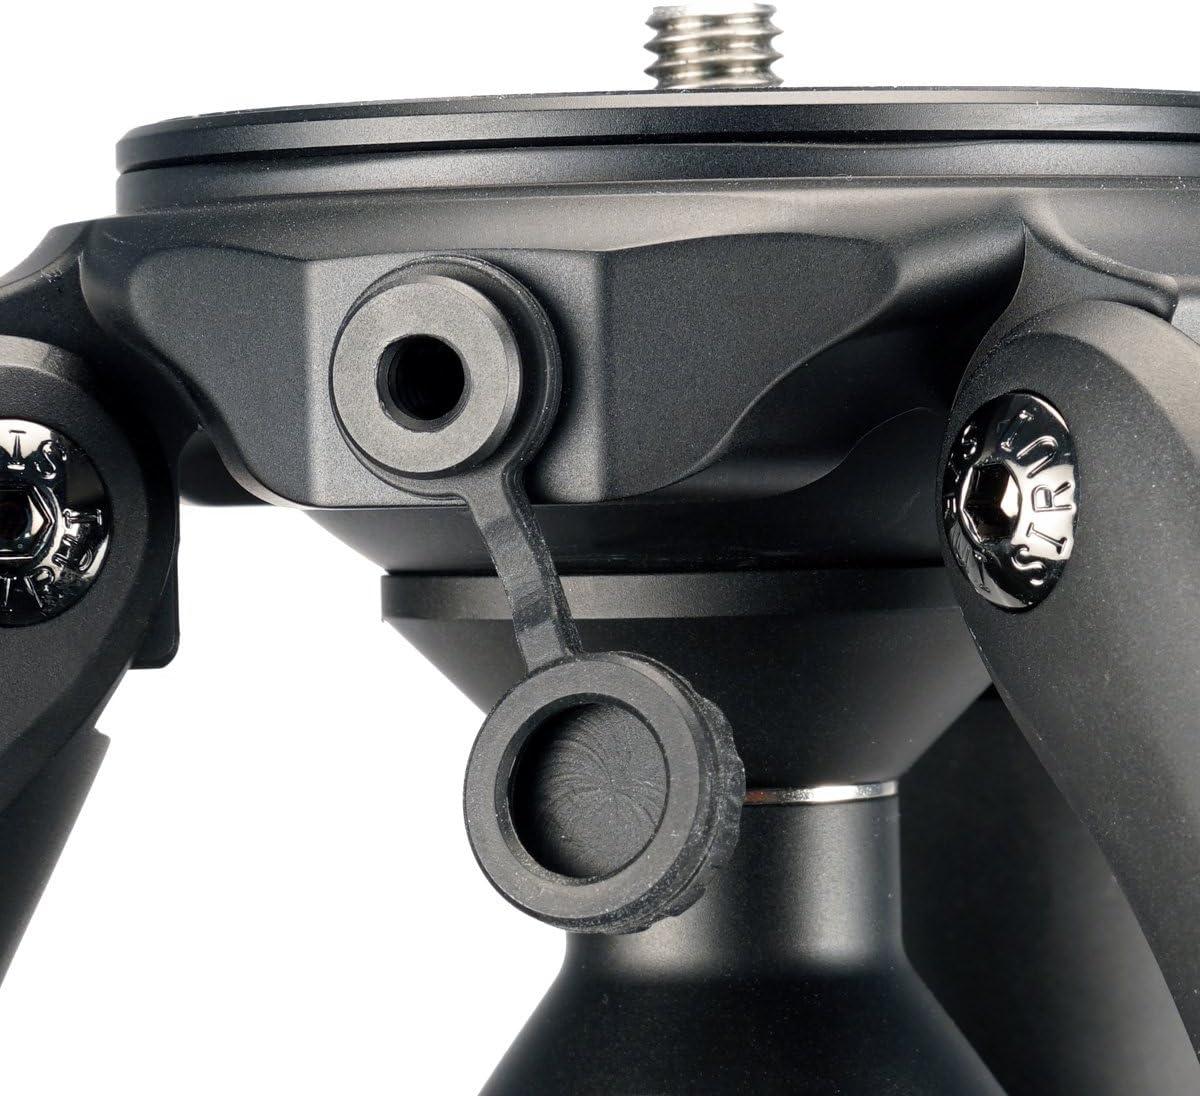 Includes Sirui USA 6-Year Warranty Max Load 55lbs Sirui SR3004 SR-Series Multi Use Carbon Fiber 4-Section Platform Tripod Legs Set